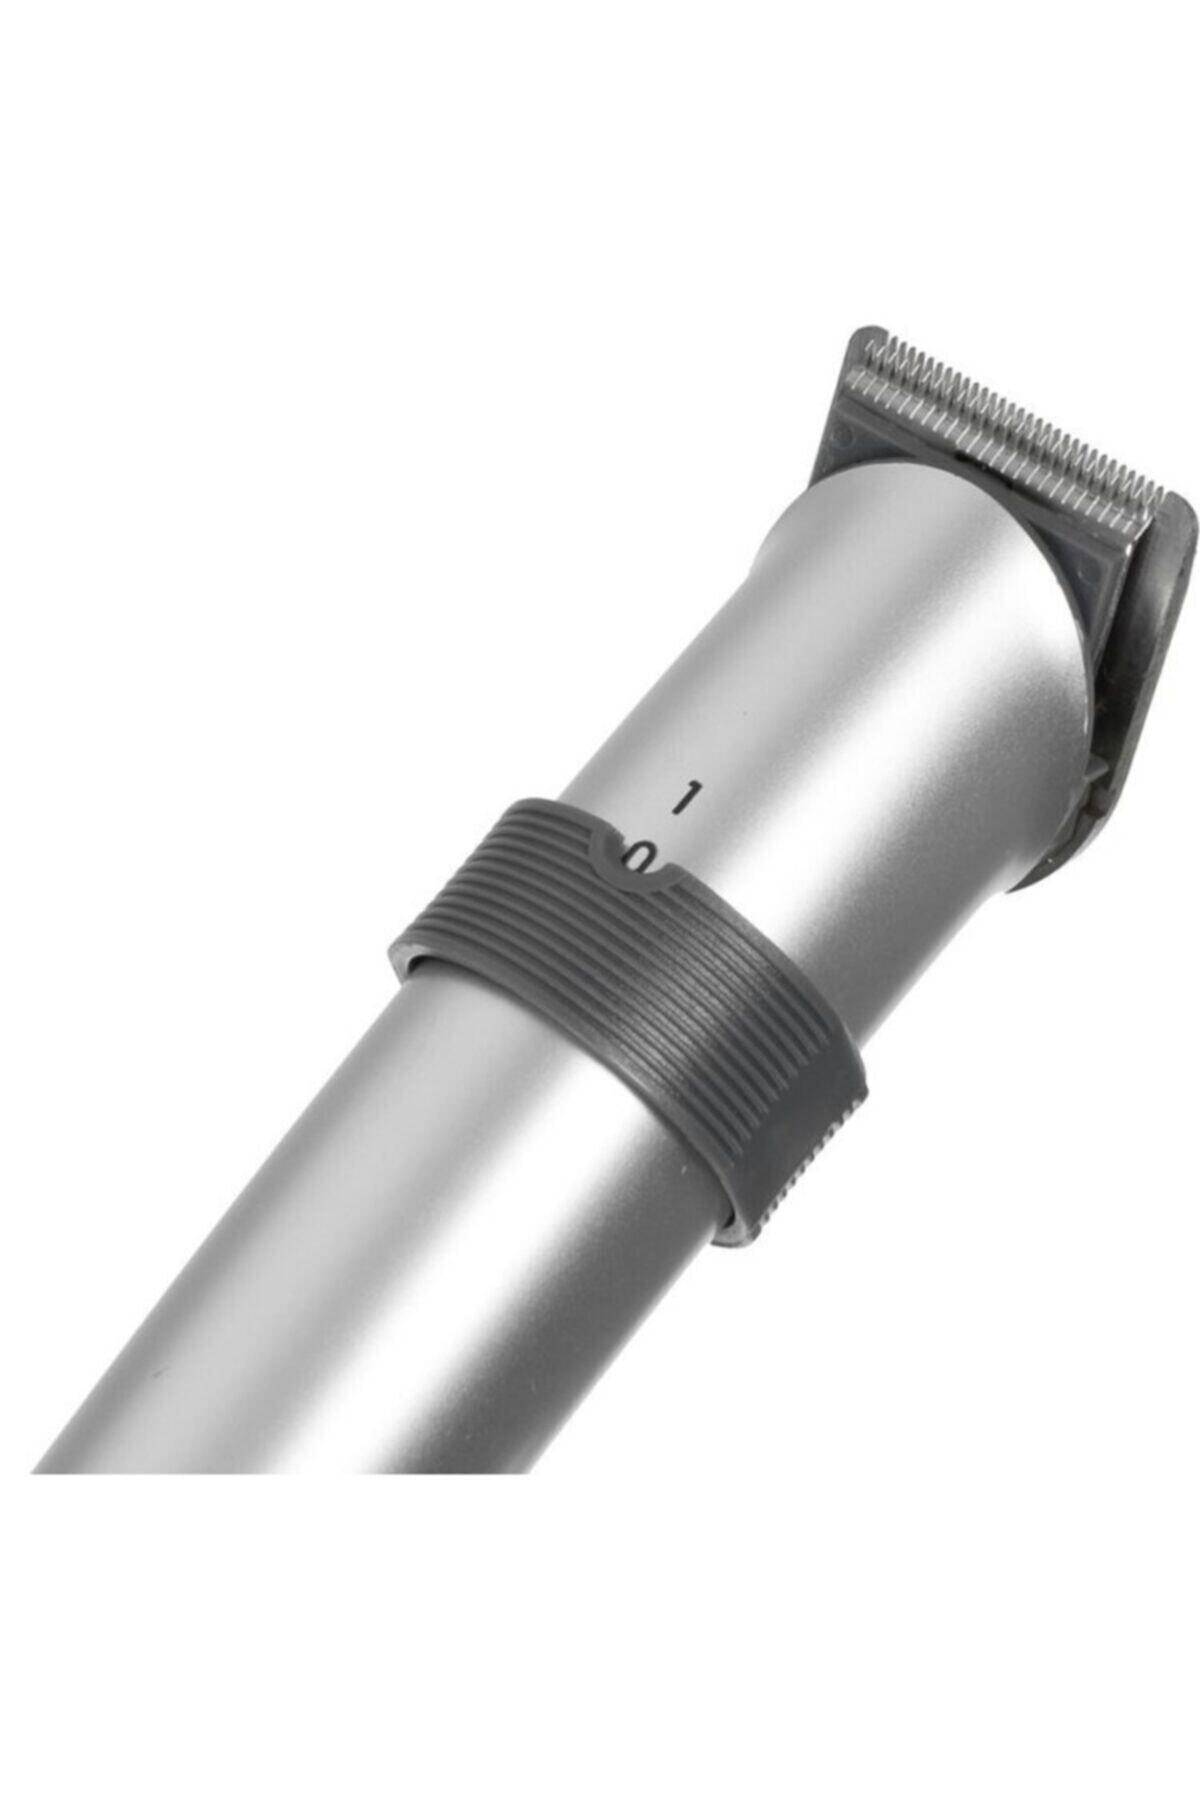 thorqtech 609 Tq-a Şarjlı Tıraş Makinesi Saç Sakal Kesme Ense Traş Makinası 2